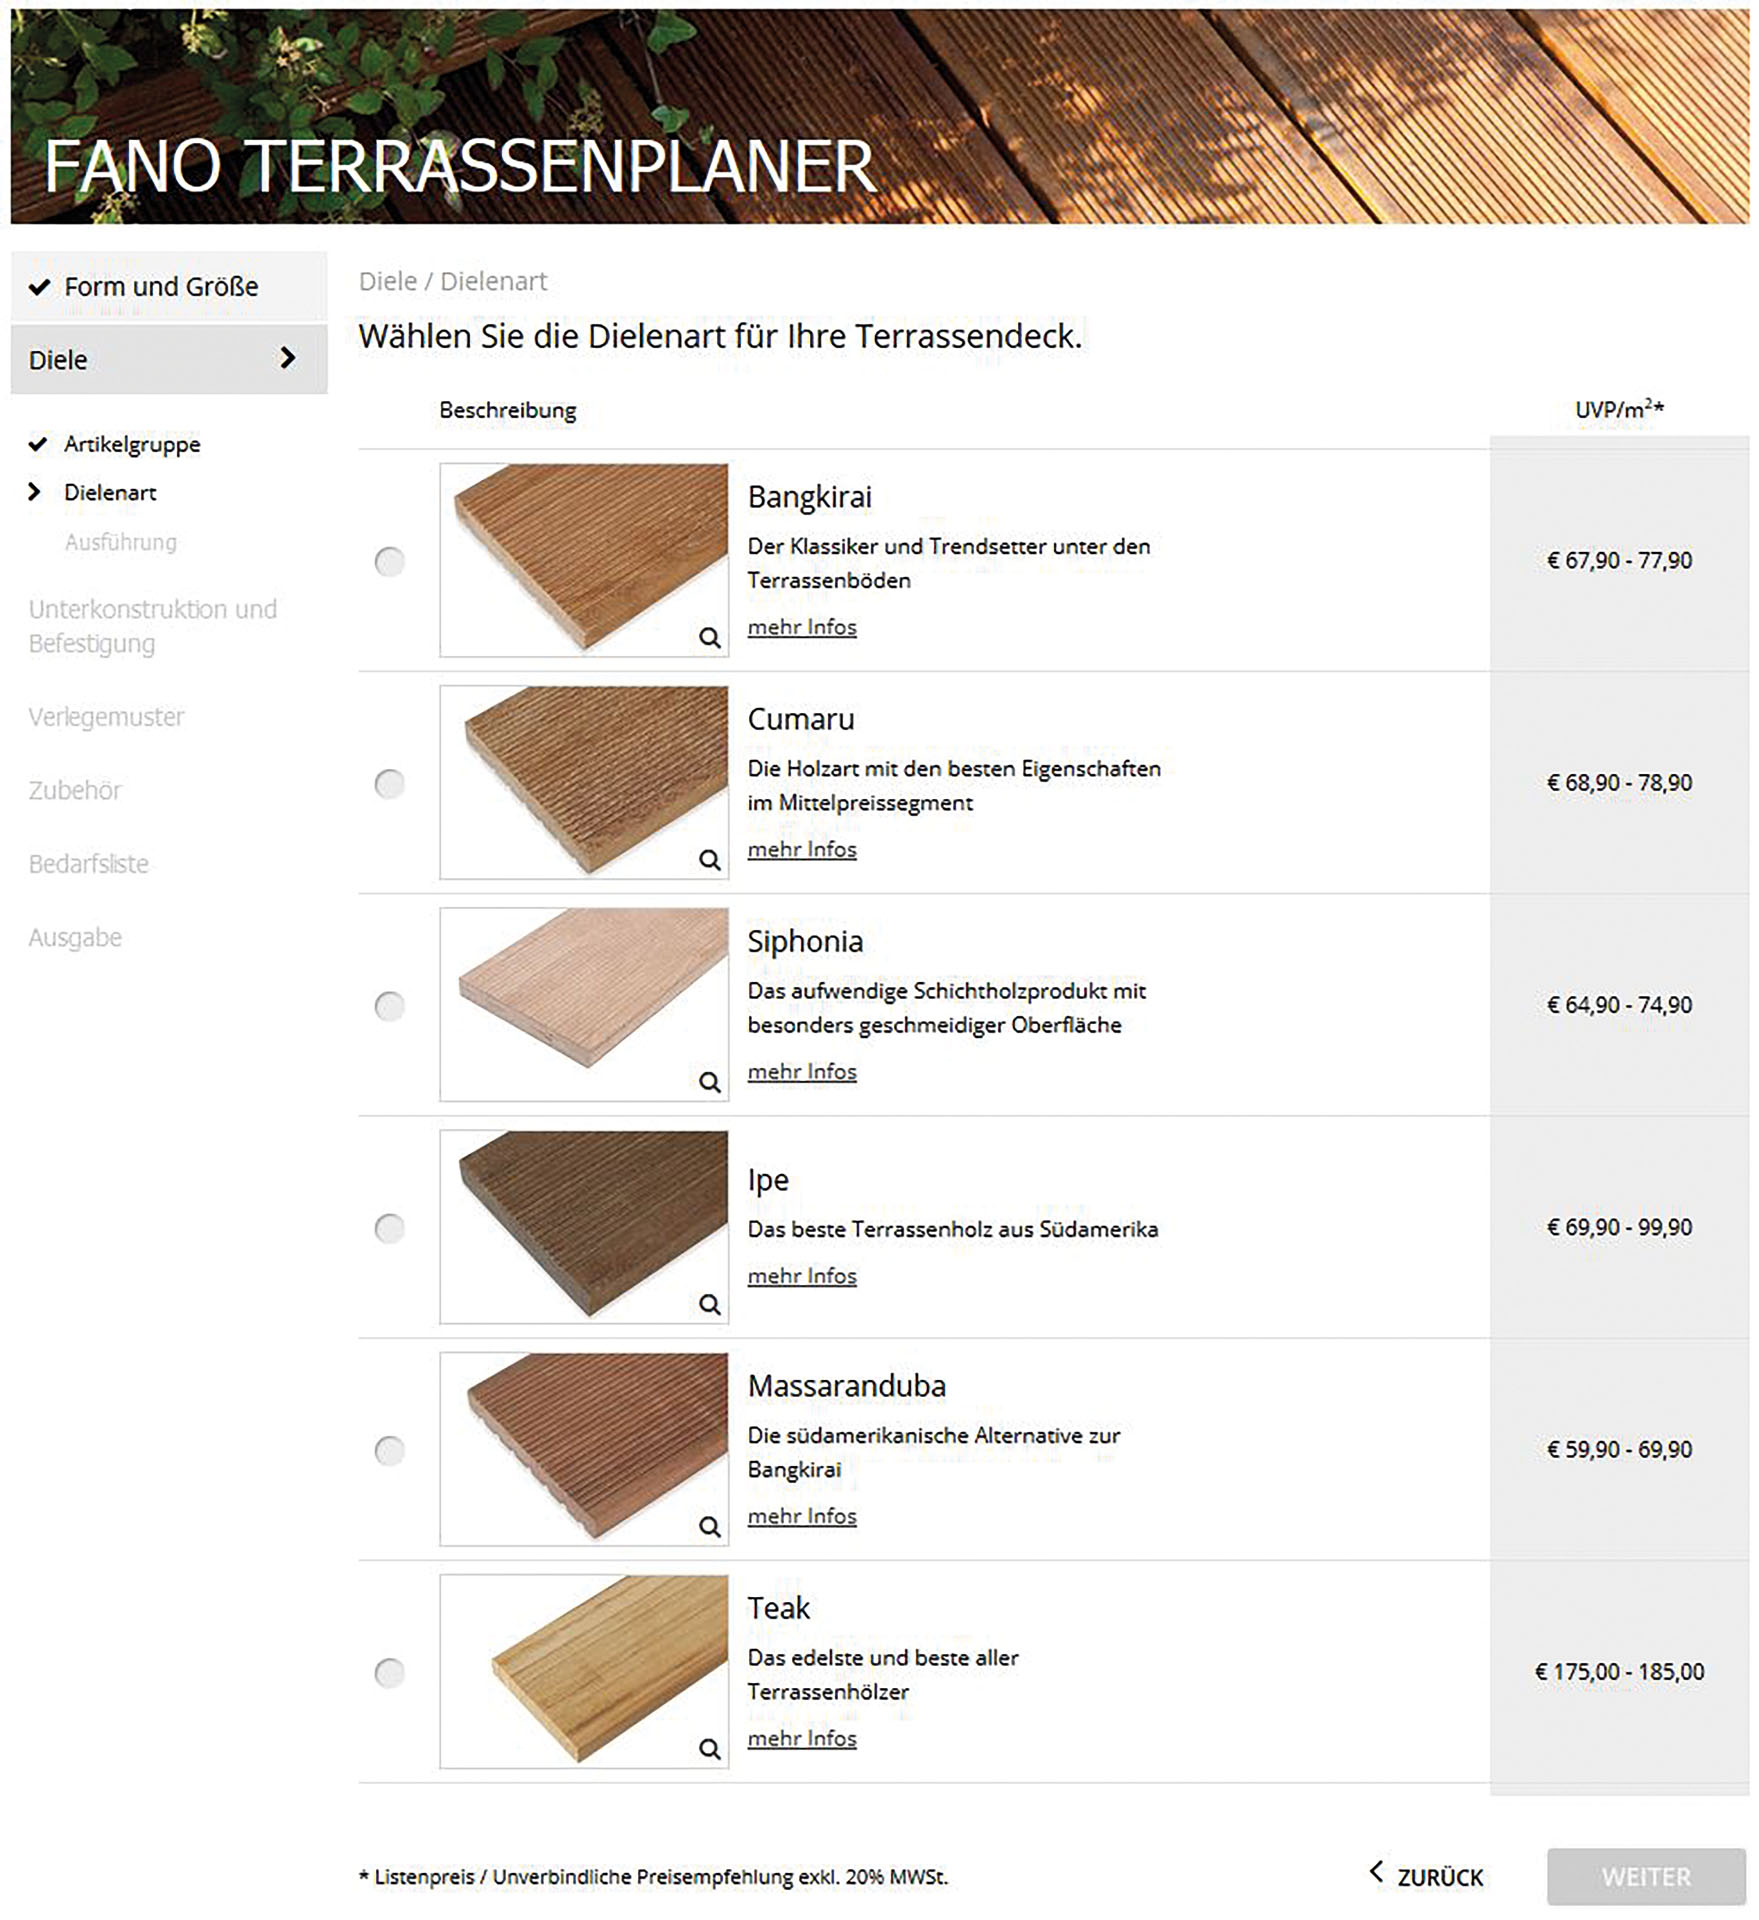 Terrassenplaner03-Produkt-auswahlen-Kopie